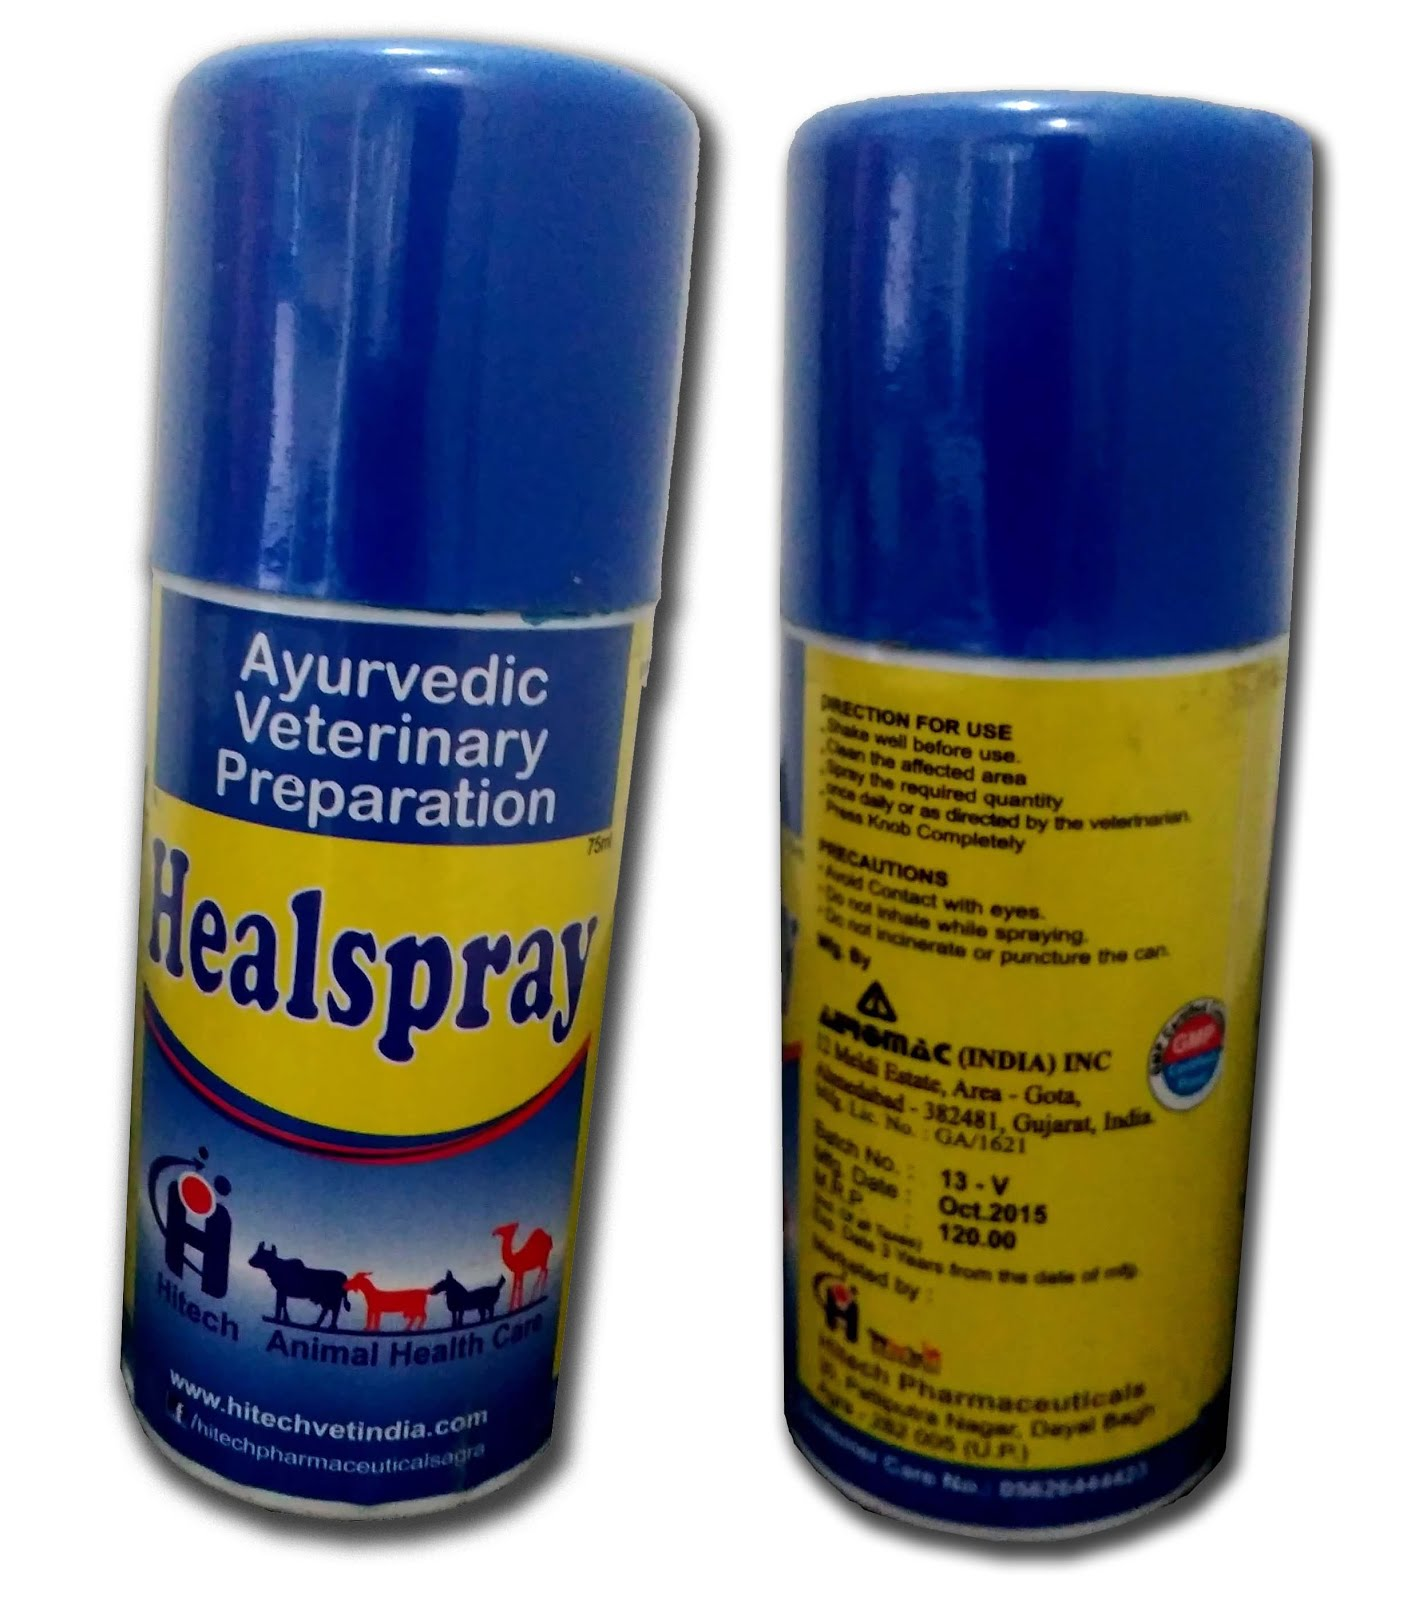 Healspray